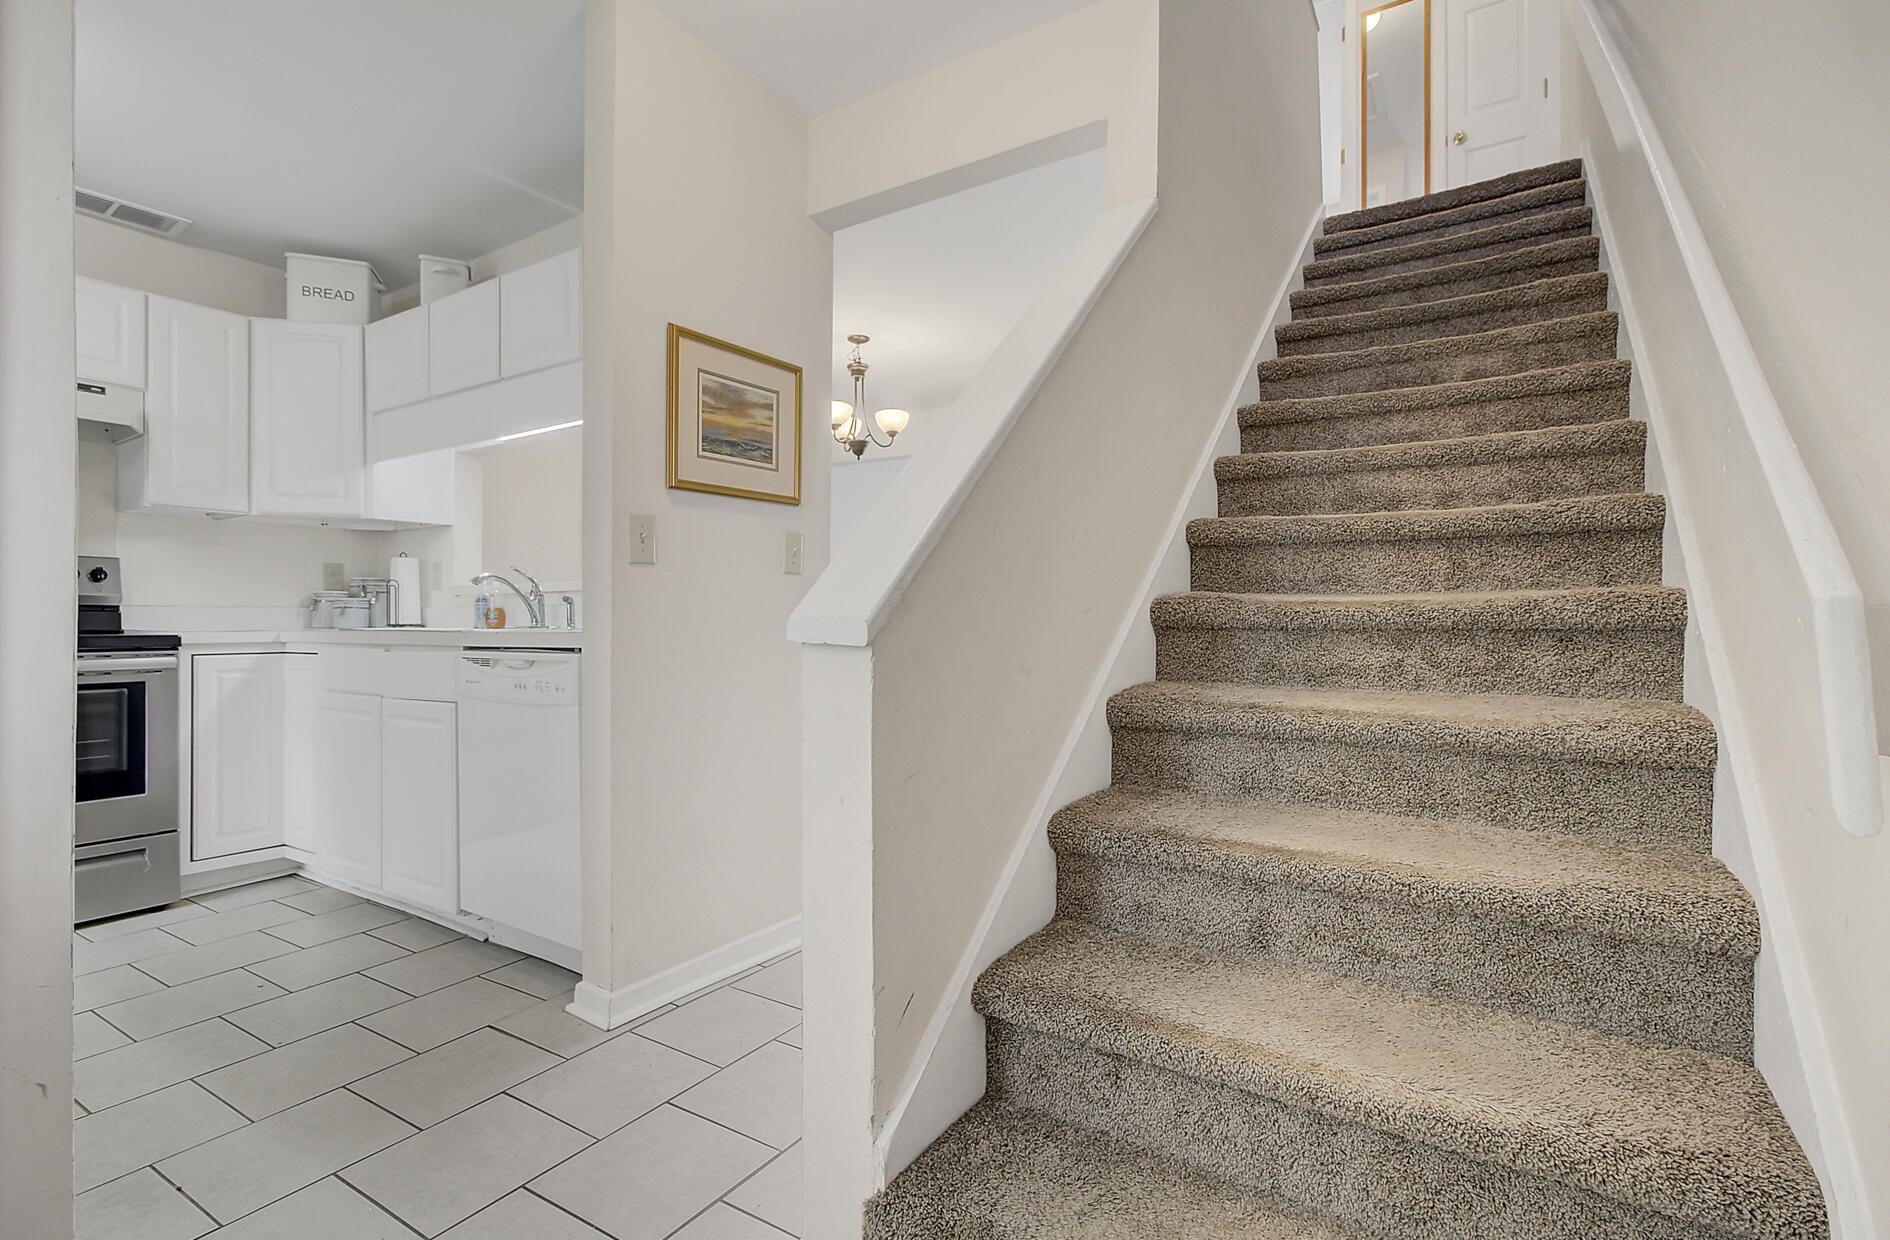 Riverland Place Homes For Sale - 234 Stefan, Charleston, SC - 7